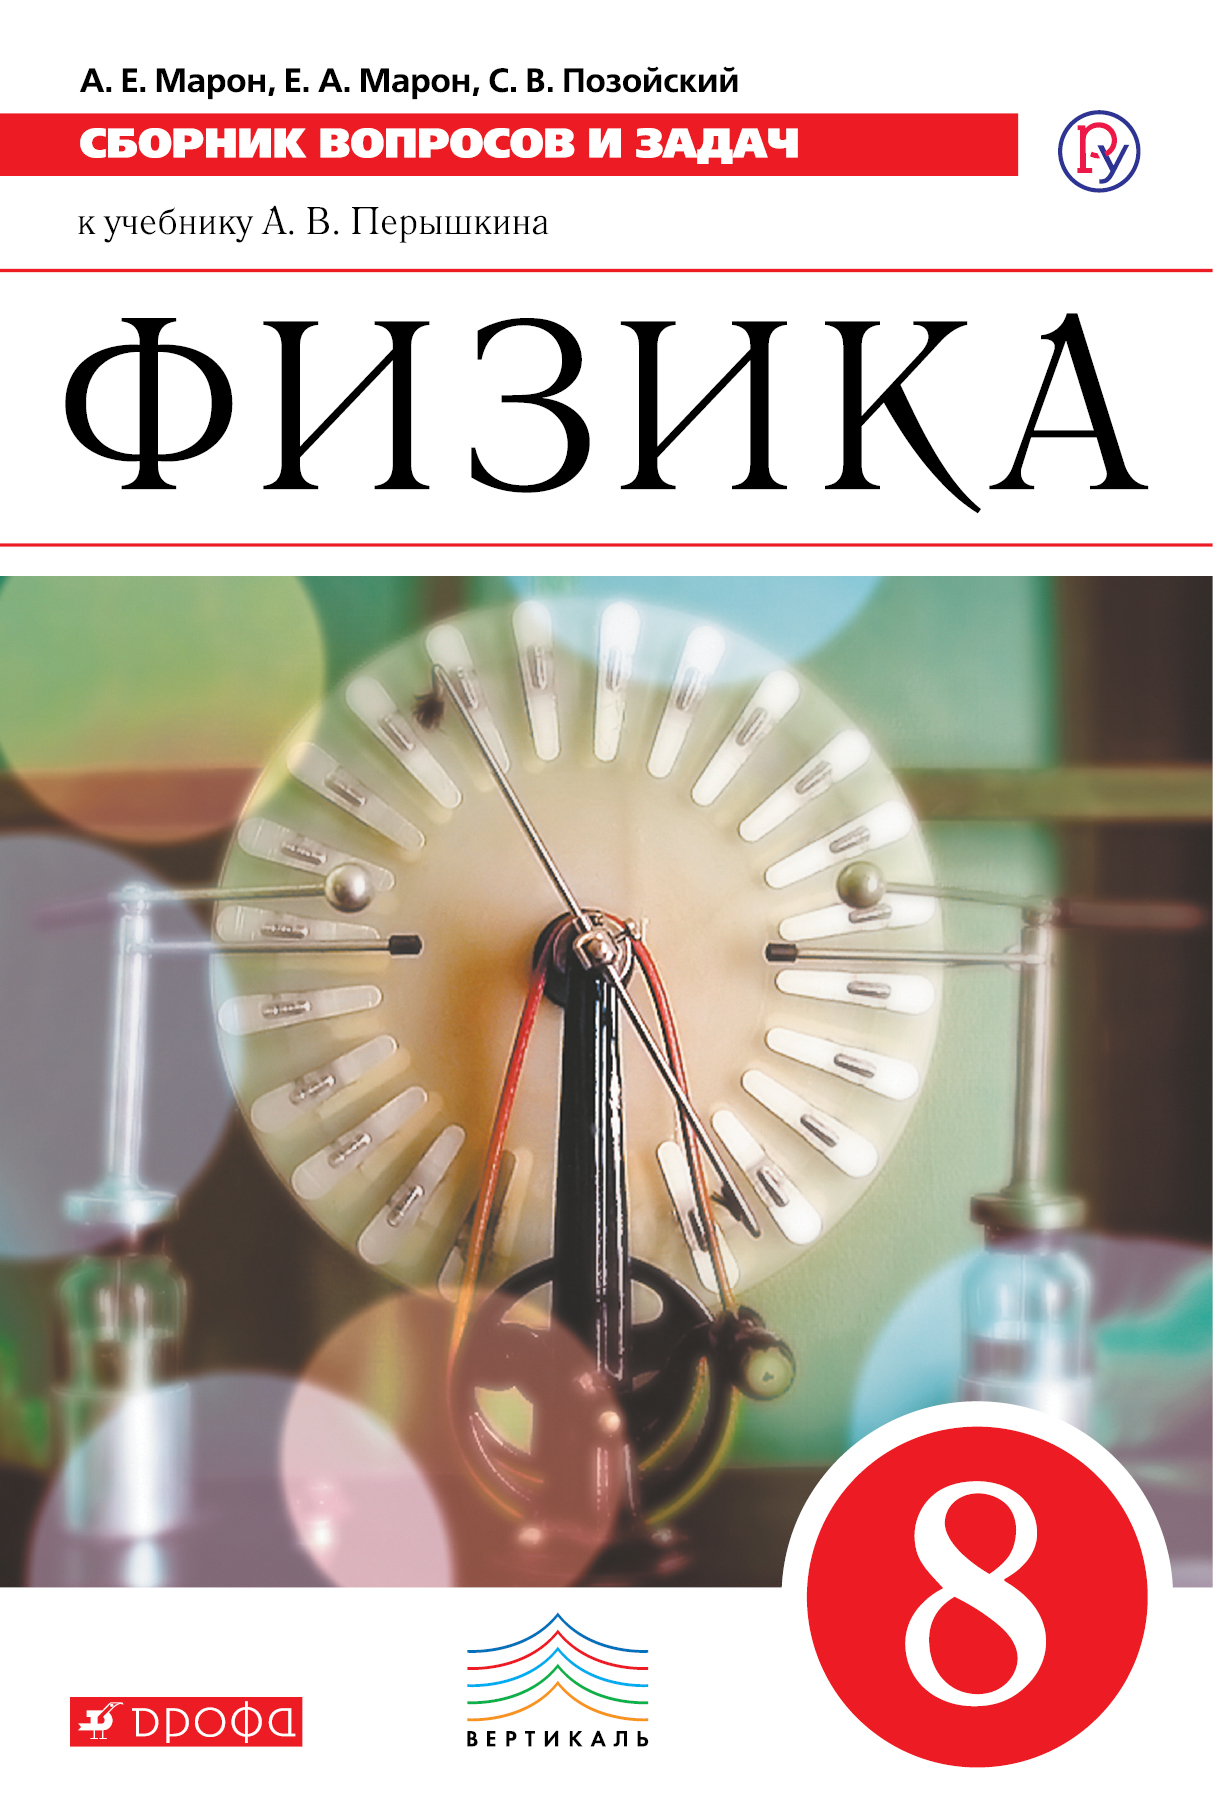 Физика. Сборник вопросов и задач. Демо-версия. 8 класс Марон Марон Позойский